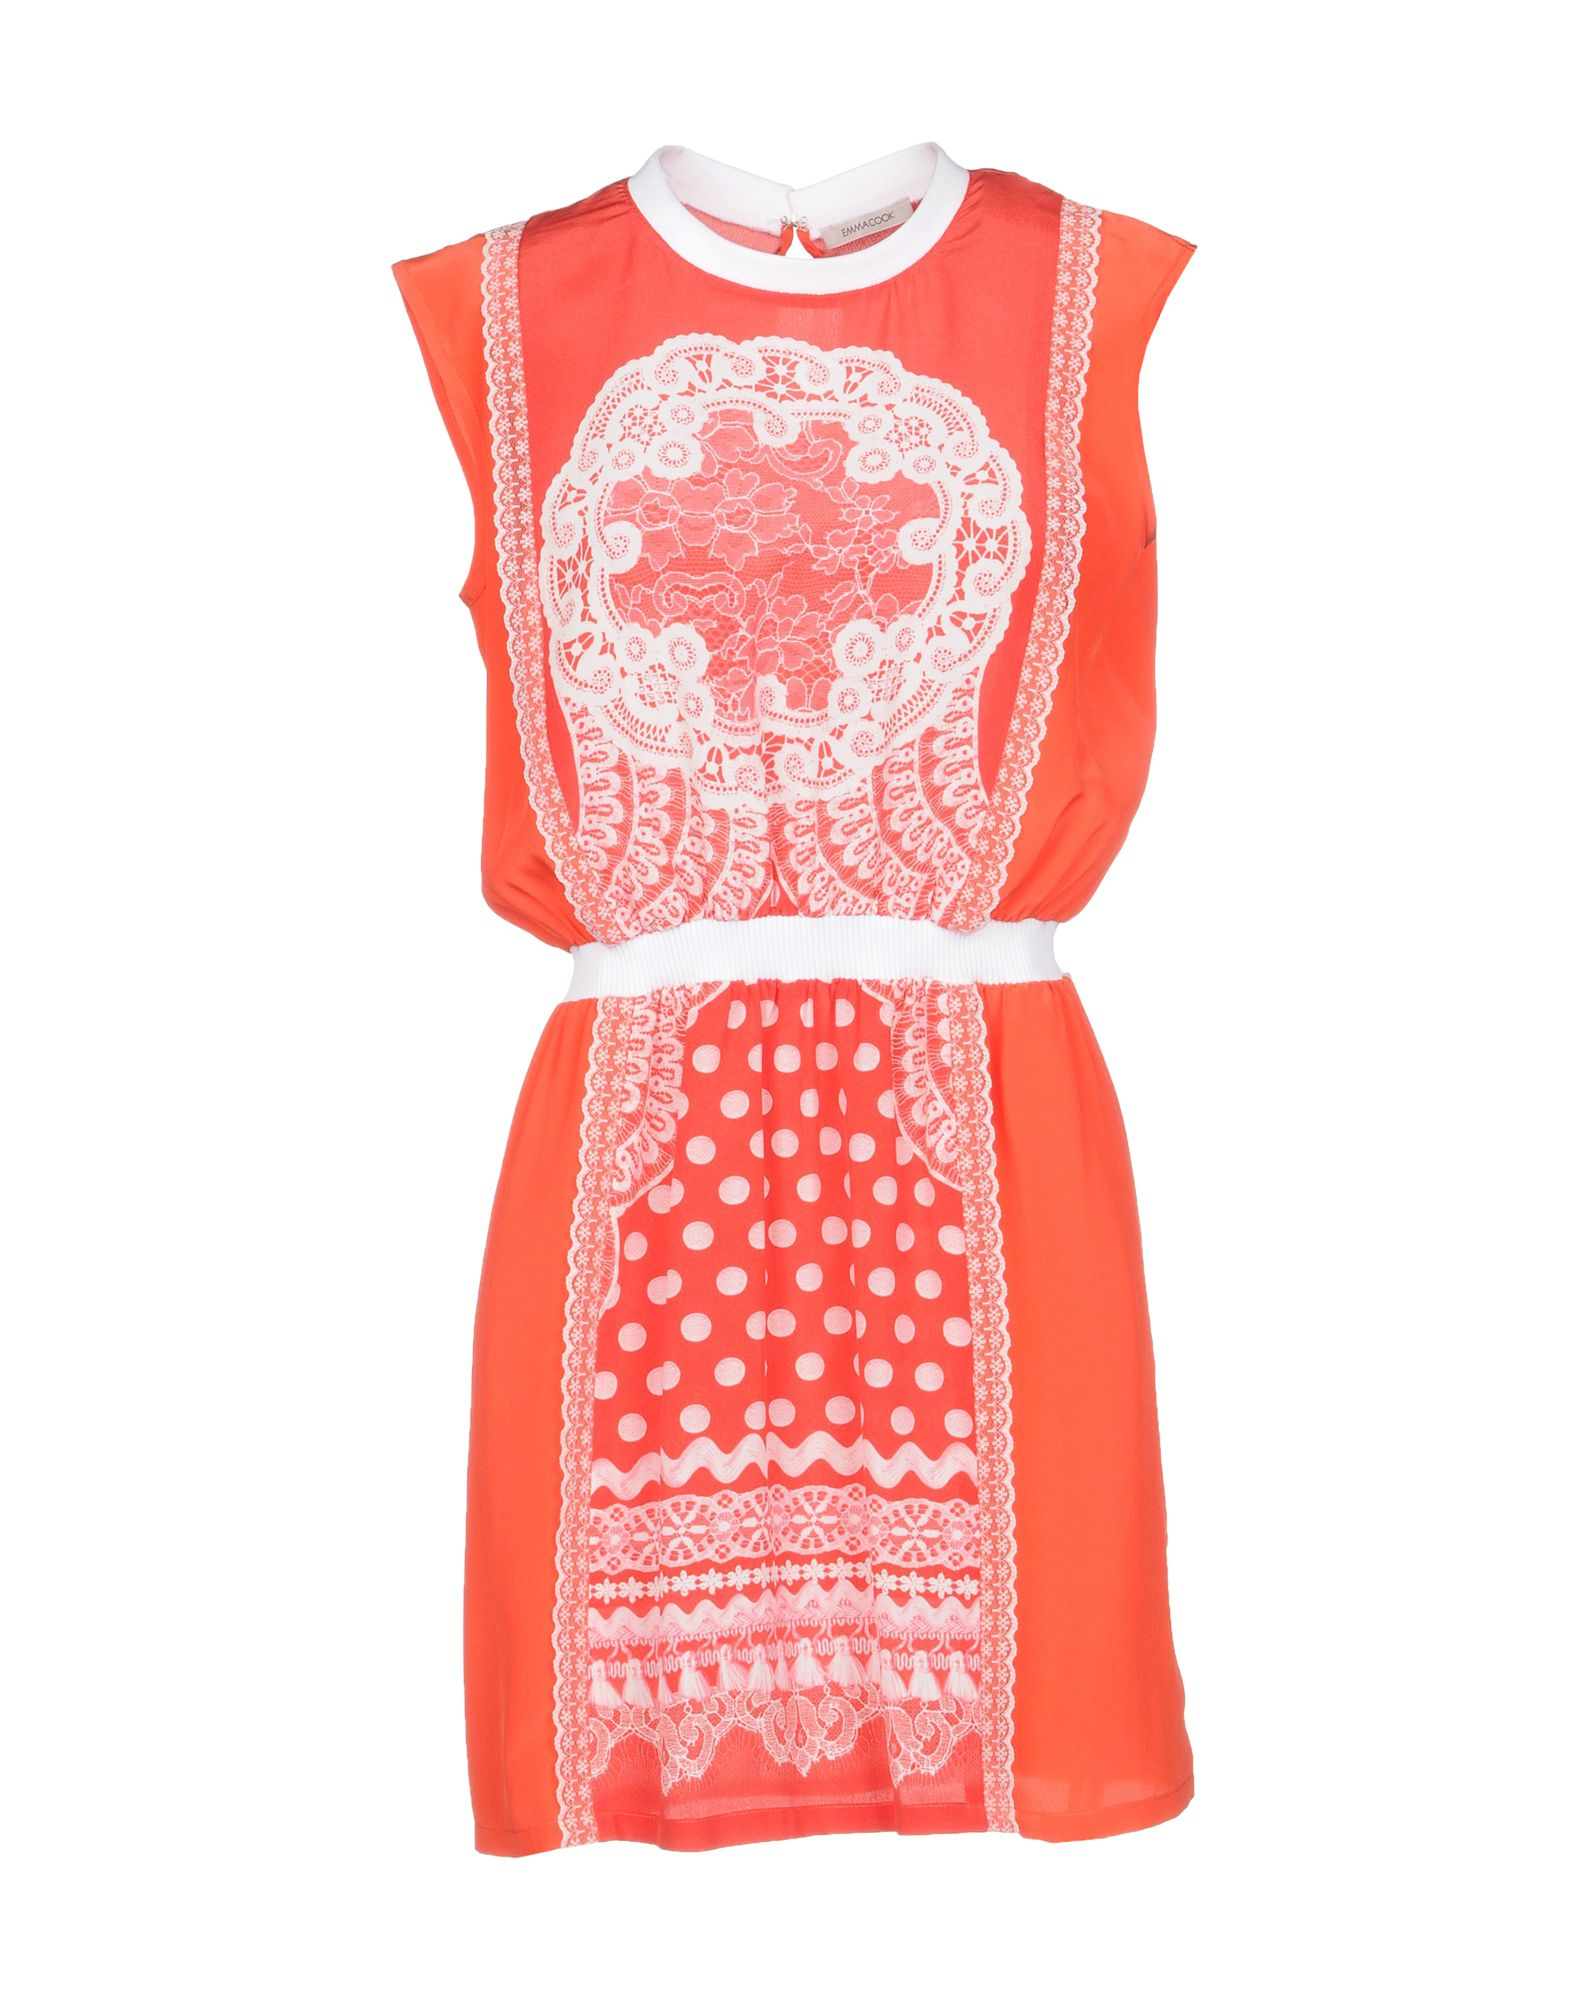 EMMA COOK Short Dress in Red